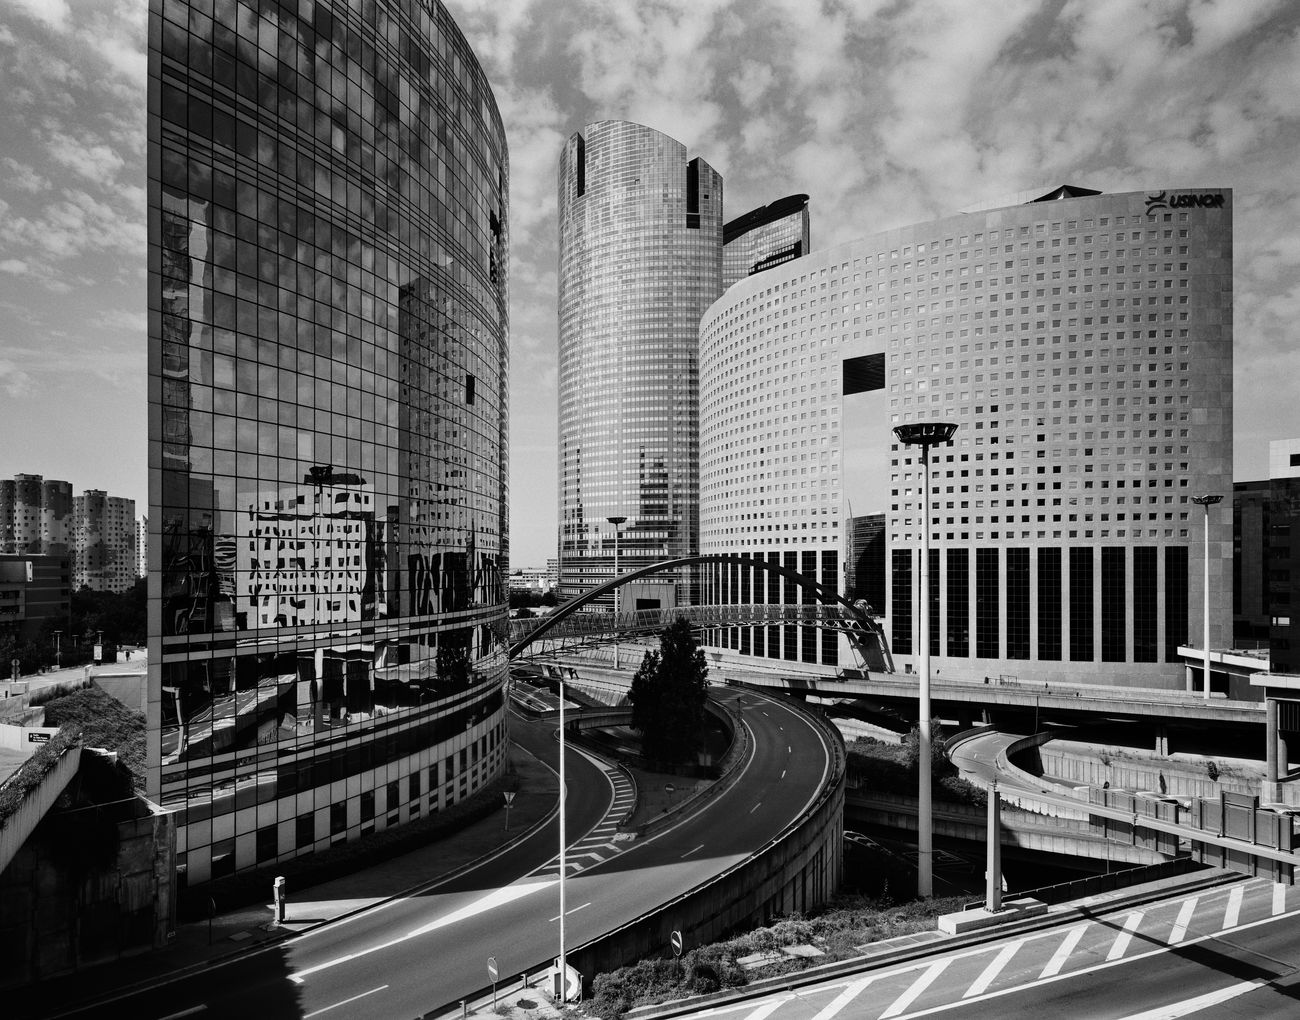 Gabriele Basilico, Paris, 1997. © Archivio Gabriele Basilico